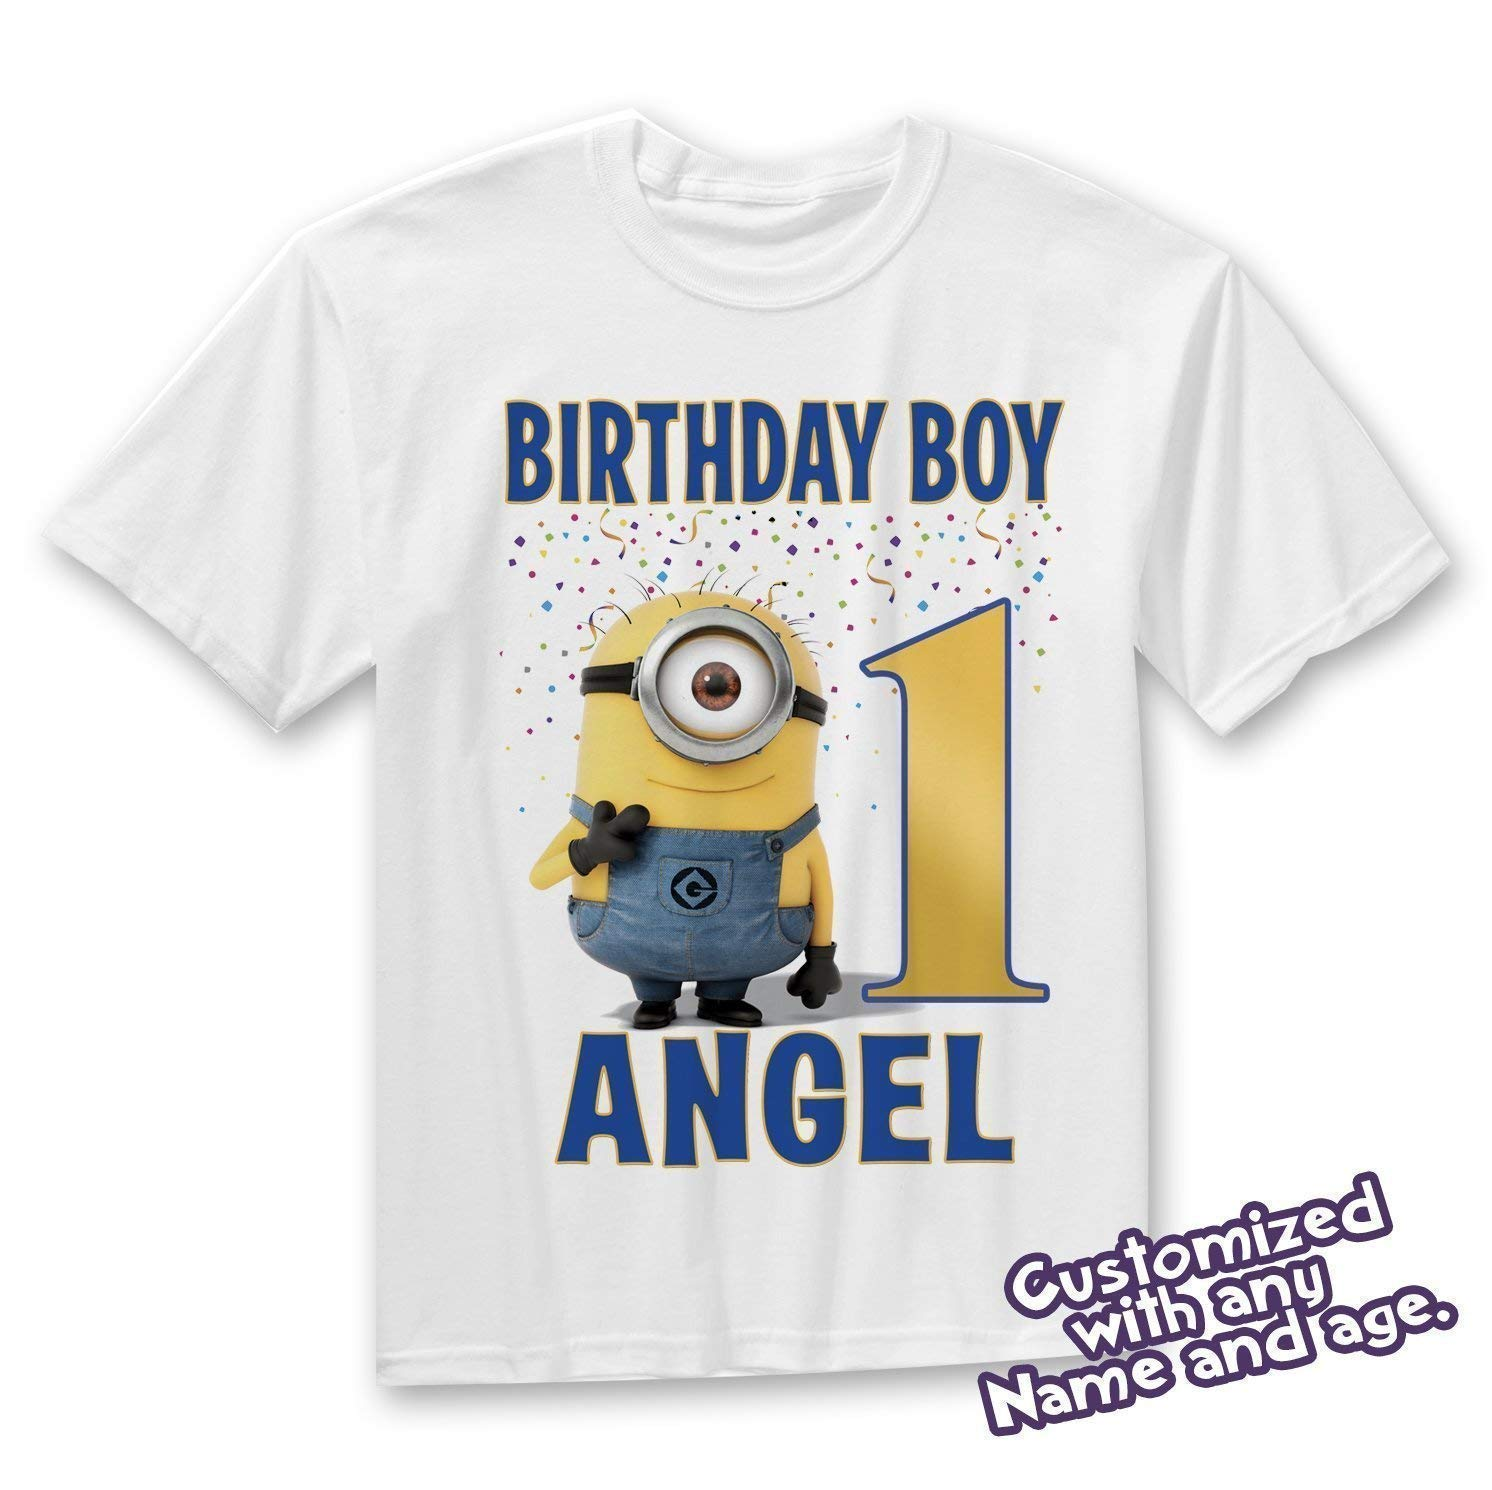 Minions Birthday Shirt Customized Name-Age Personalized Minions Family Shirts